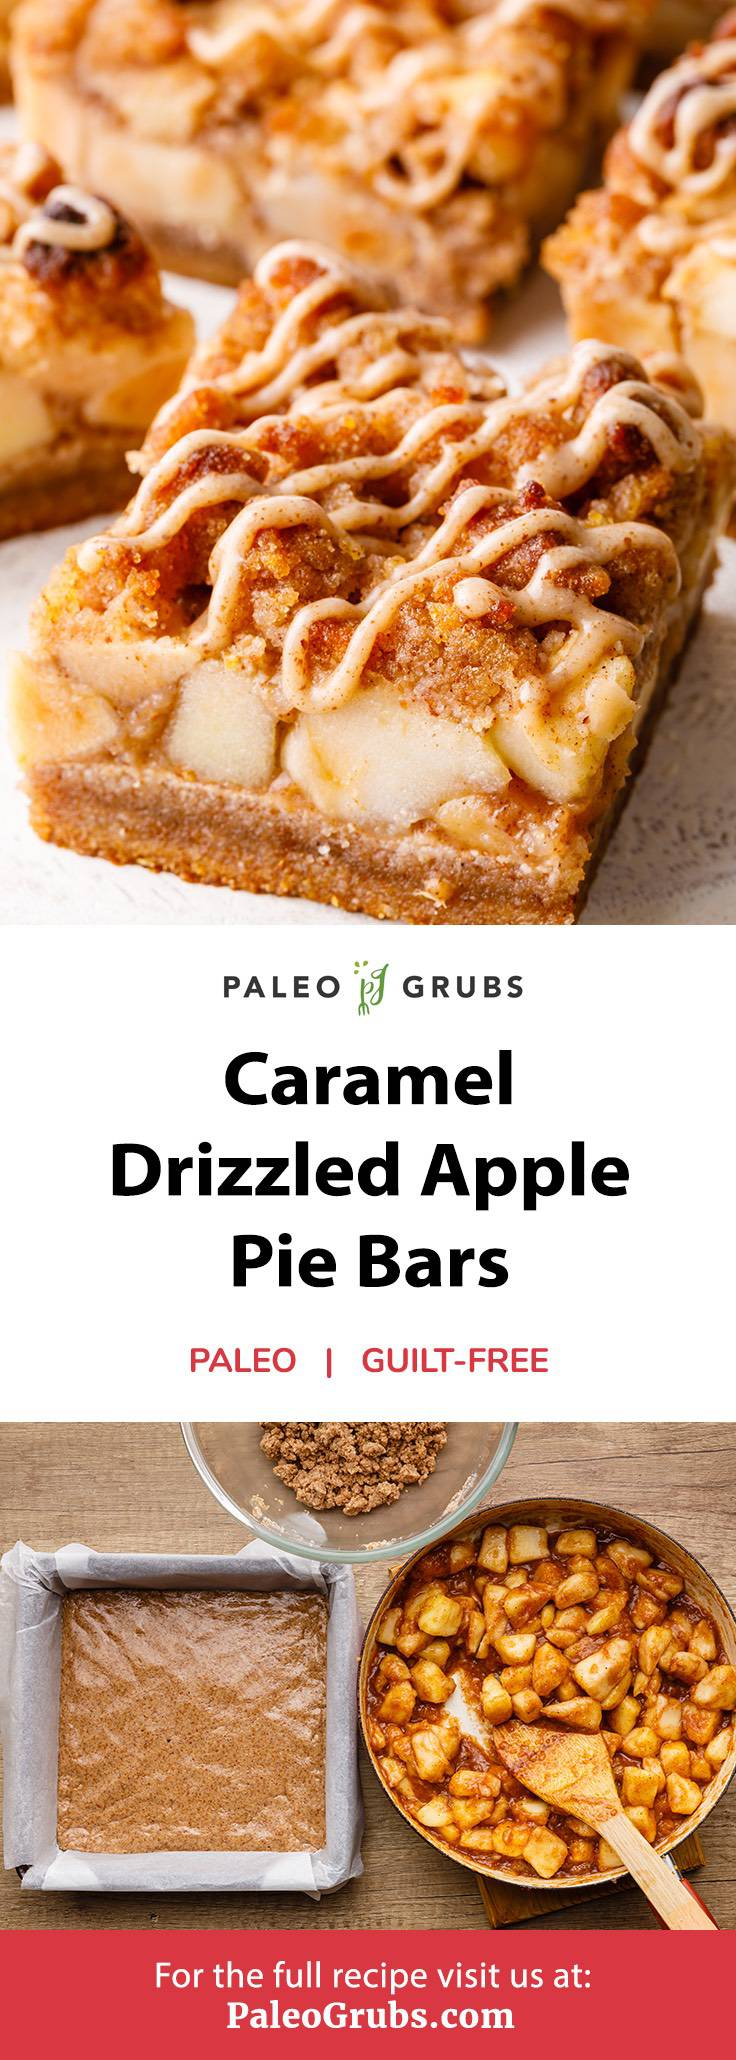 Caramel Drizzled Apple Pie Bars